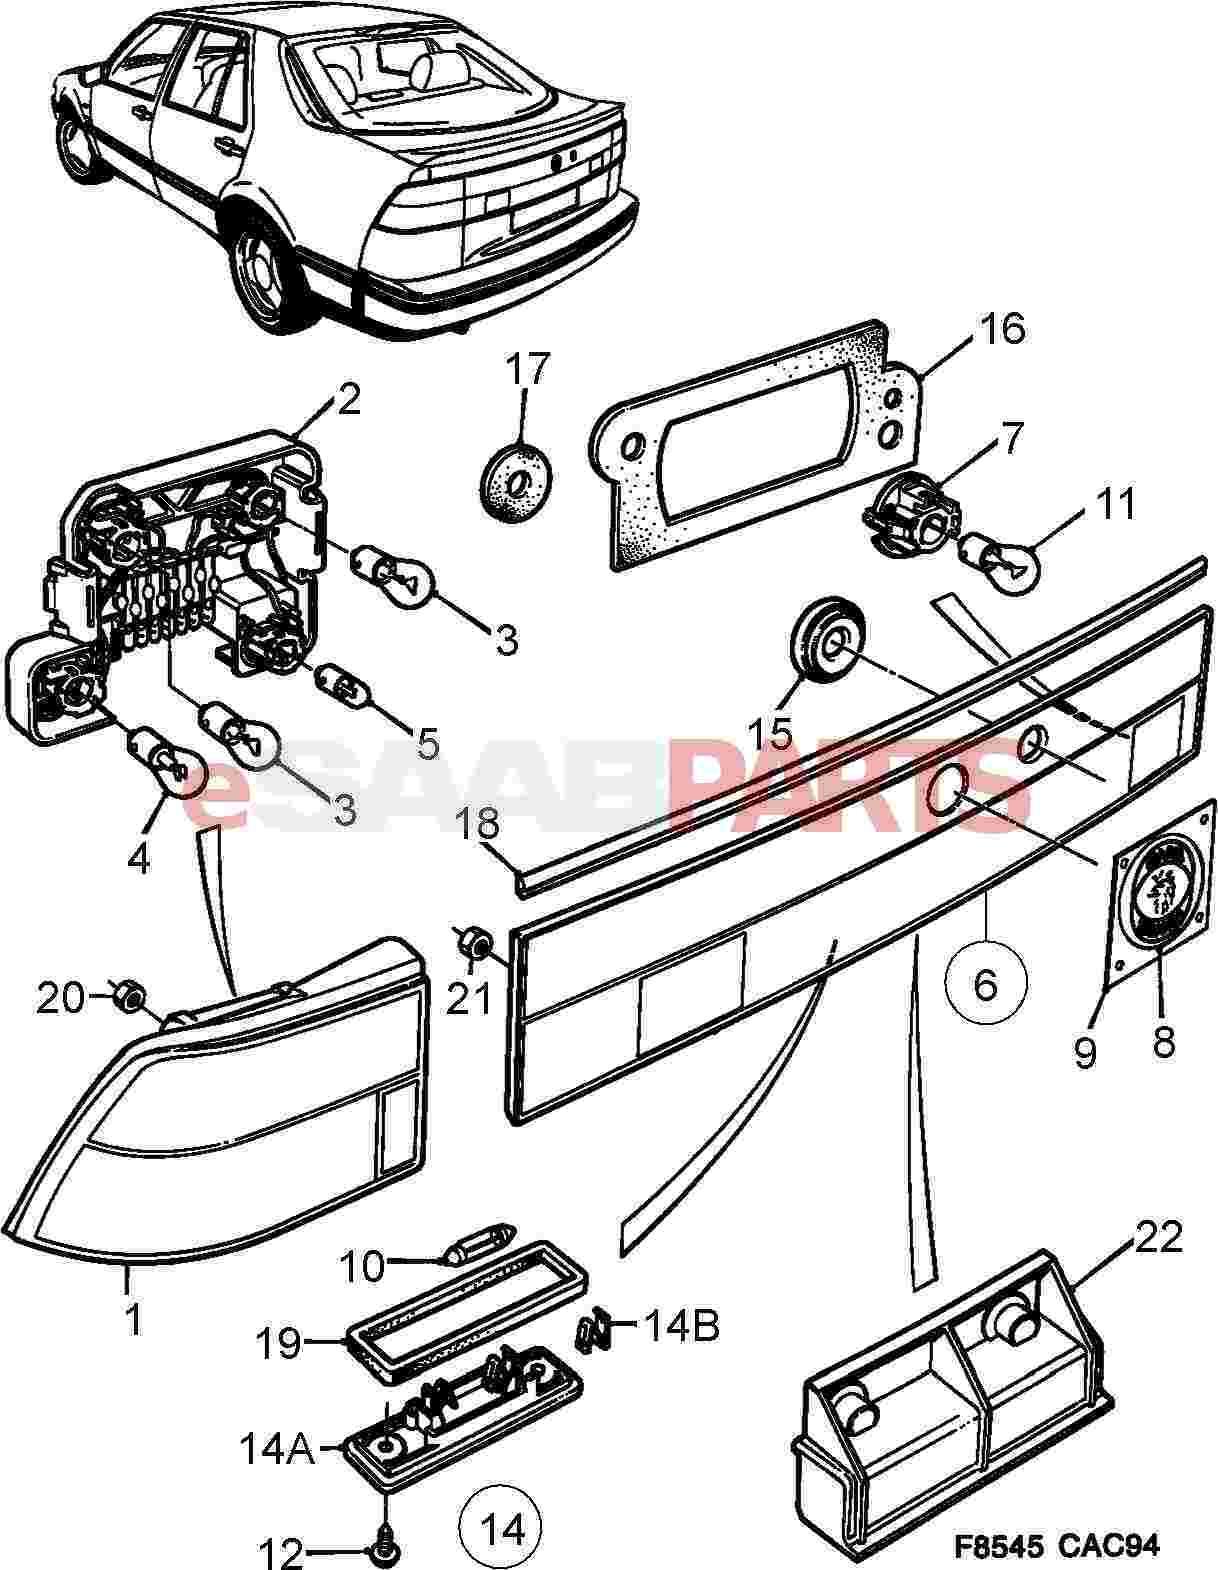 4171856  saab saab scania rear reflection panel emblem